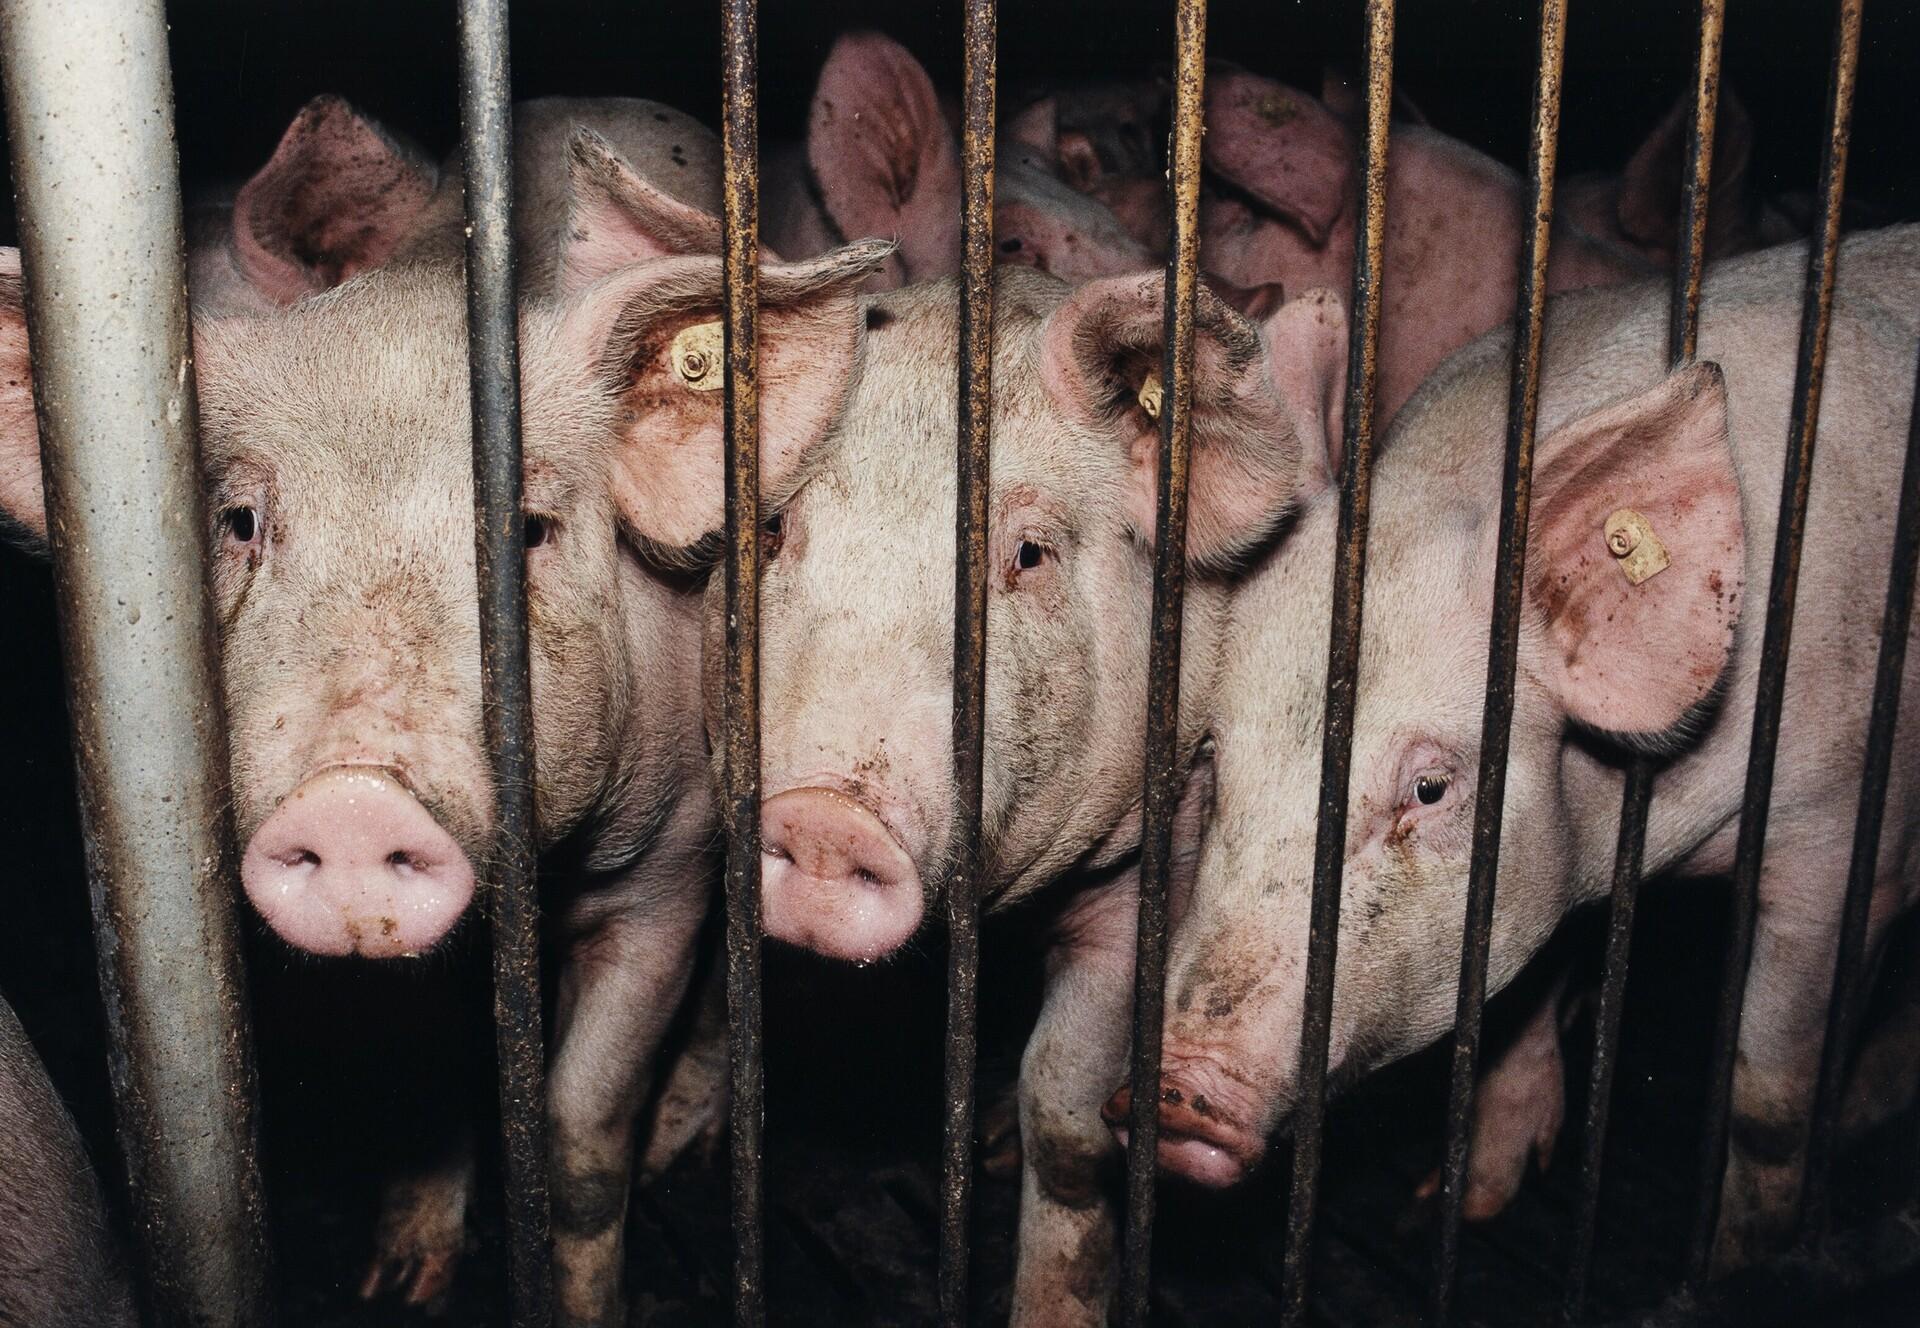 Initiative contre l'élevage intensif